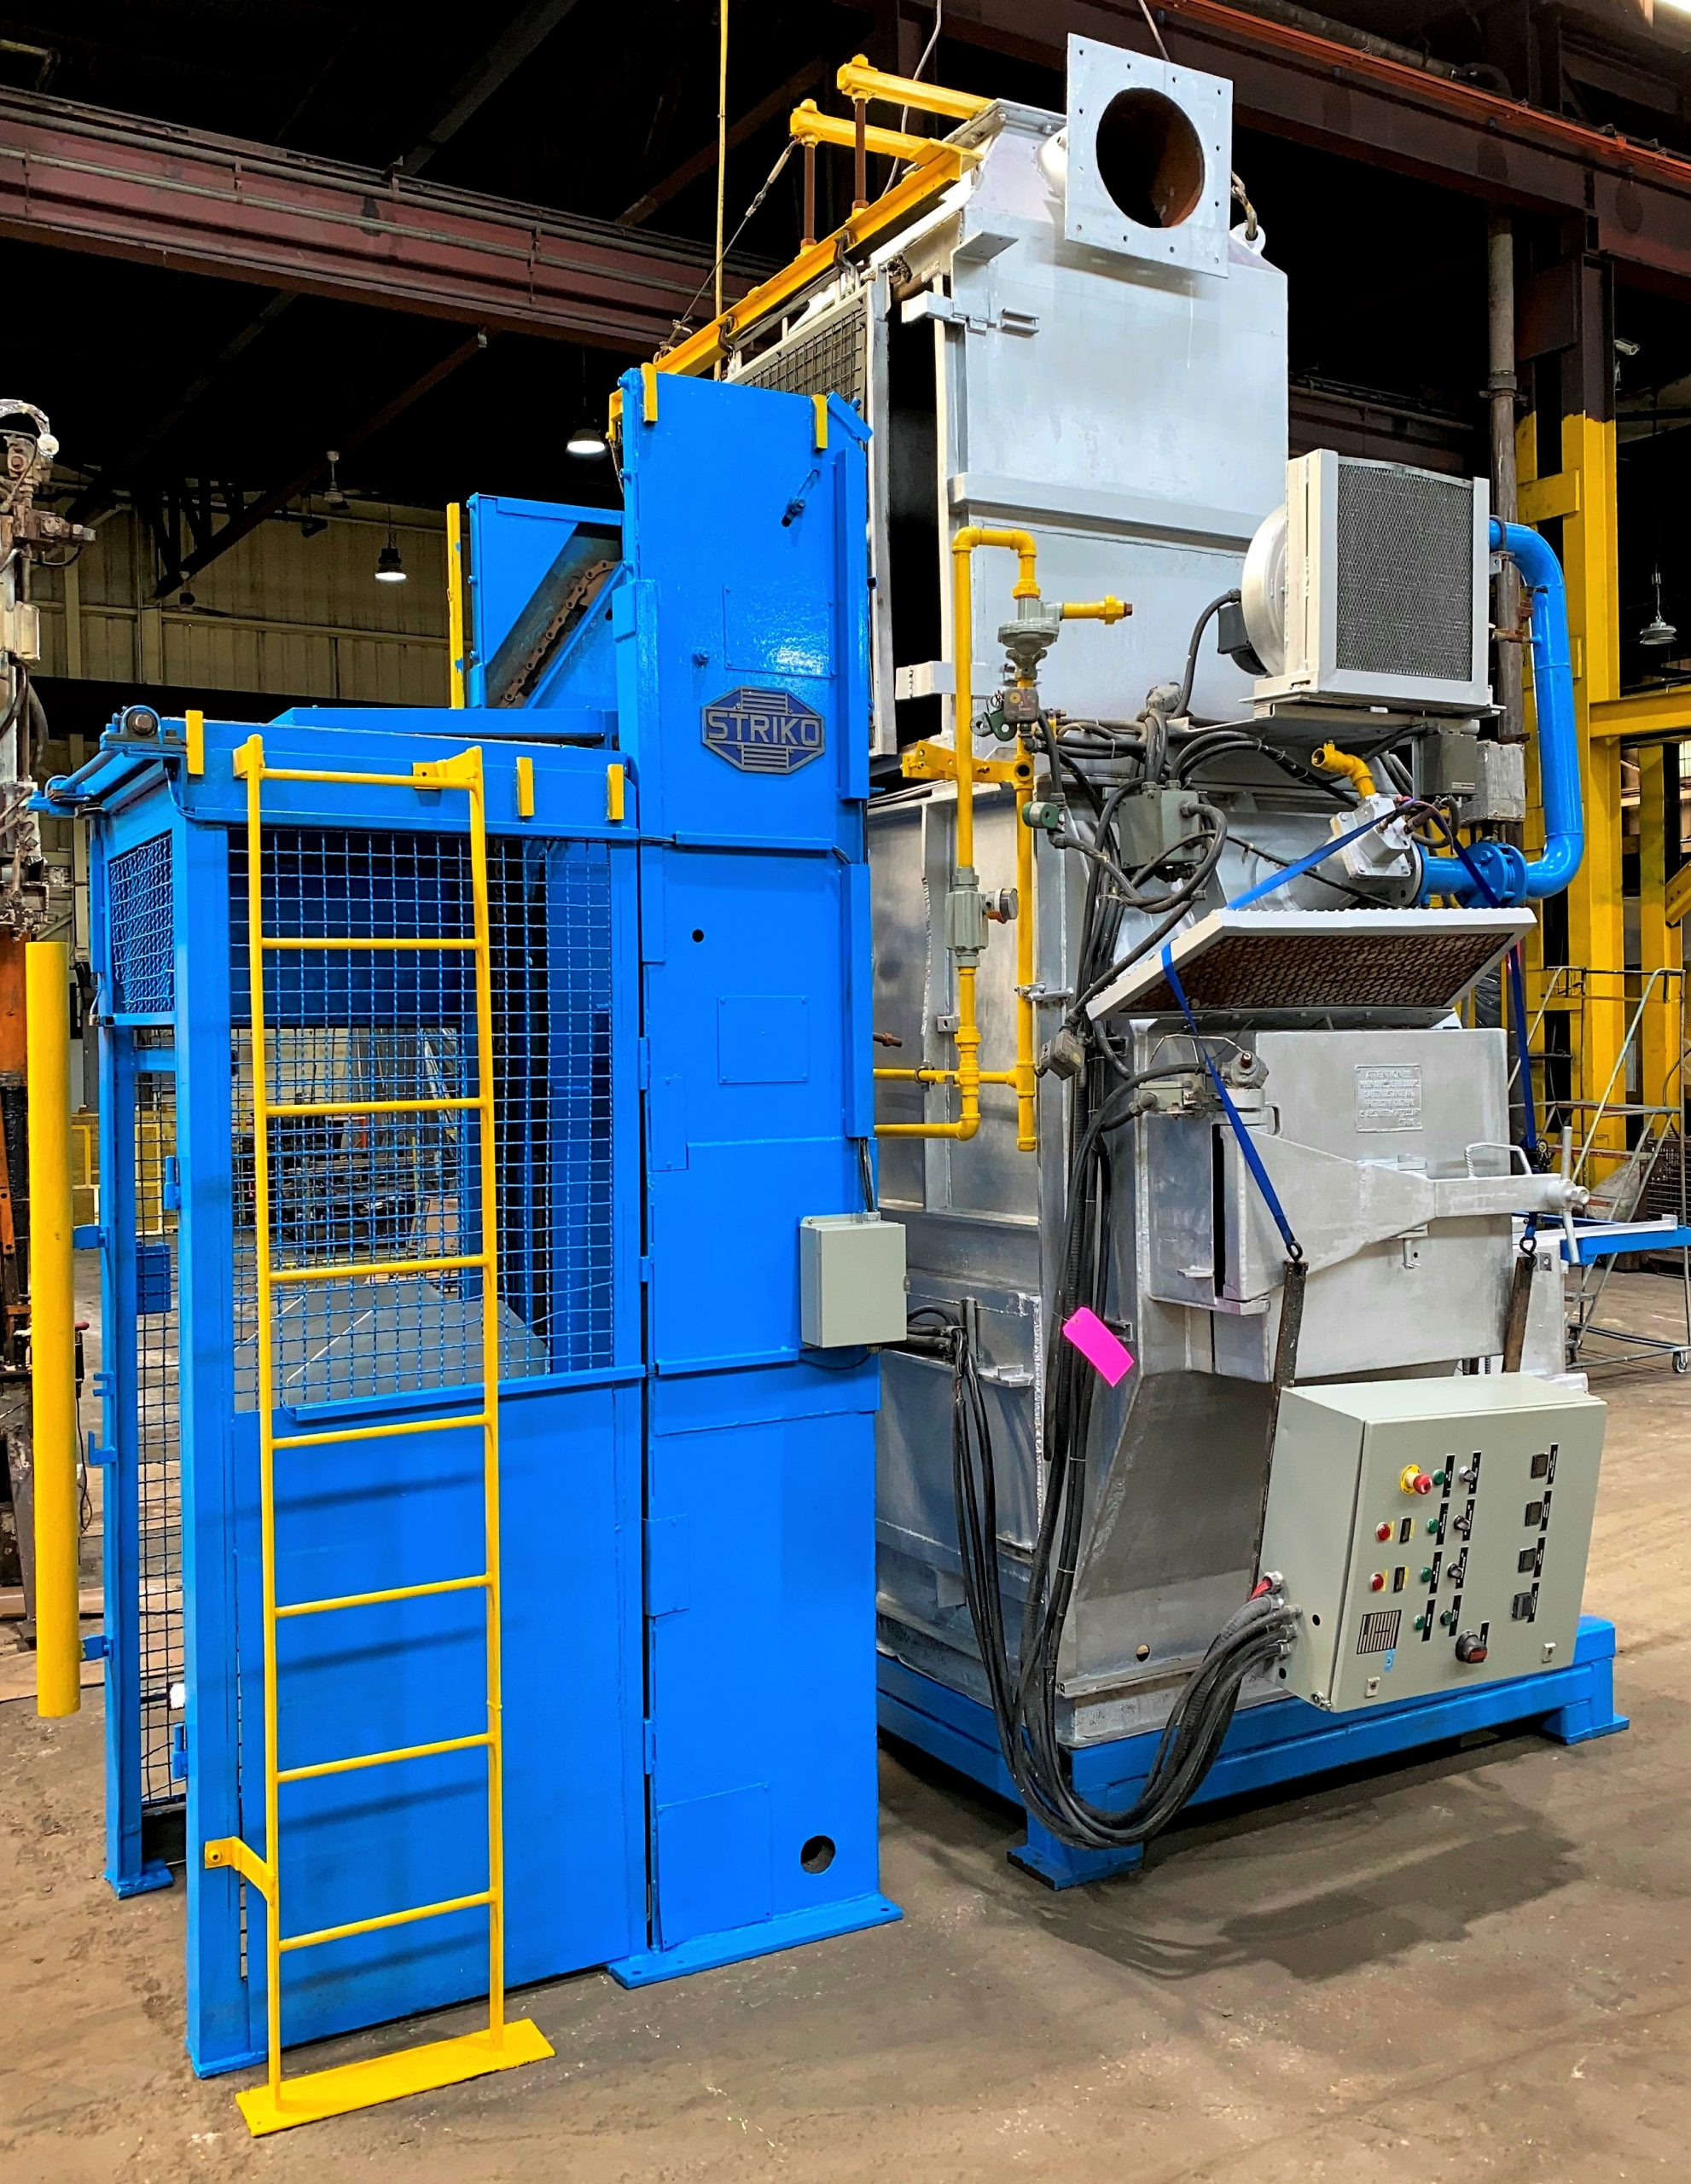 Used Striko 700 Kg Stack Melting Aluminum Gas Furnace #4897